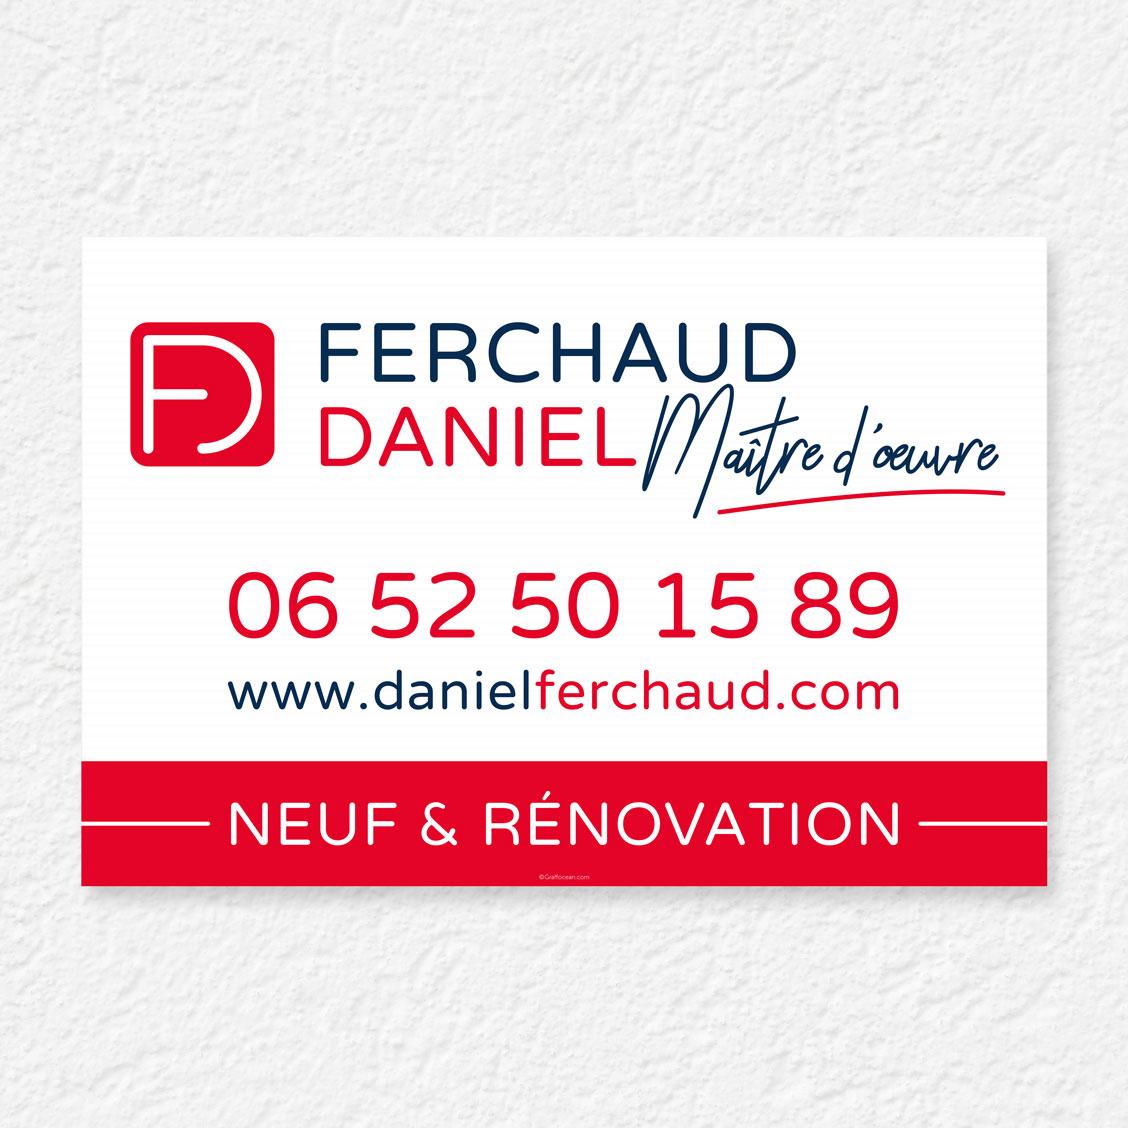 graffocean-challans-impression-panneau-akilux-ferchaud-daniel